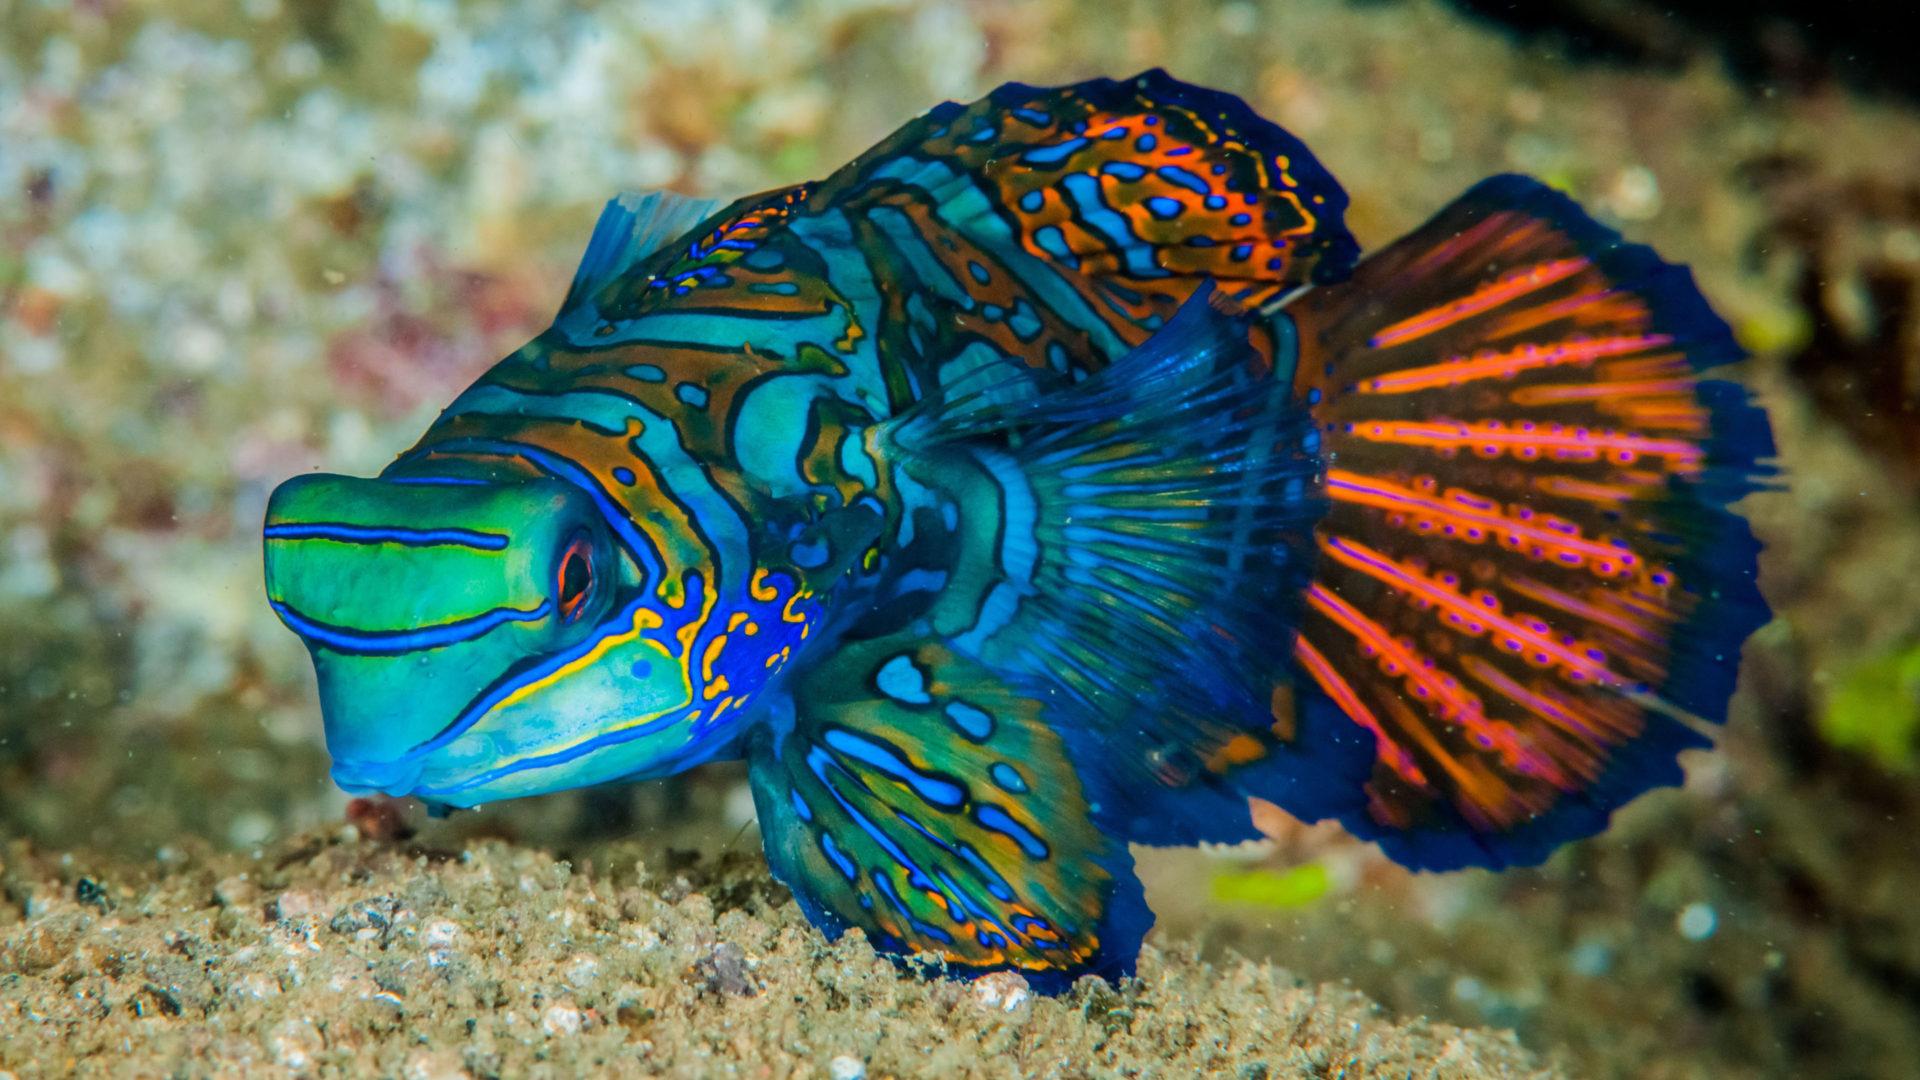 Wallpaper Aquarium 3d Mandarinfish Fish Is A Small Exotic Colorful Fish Of The